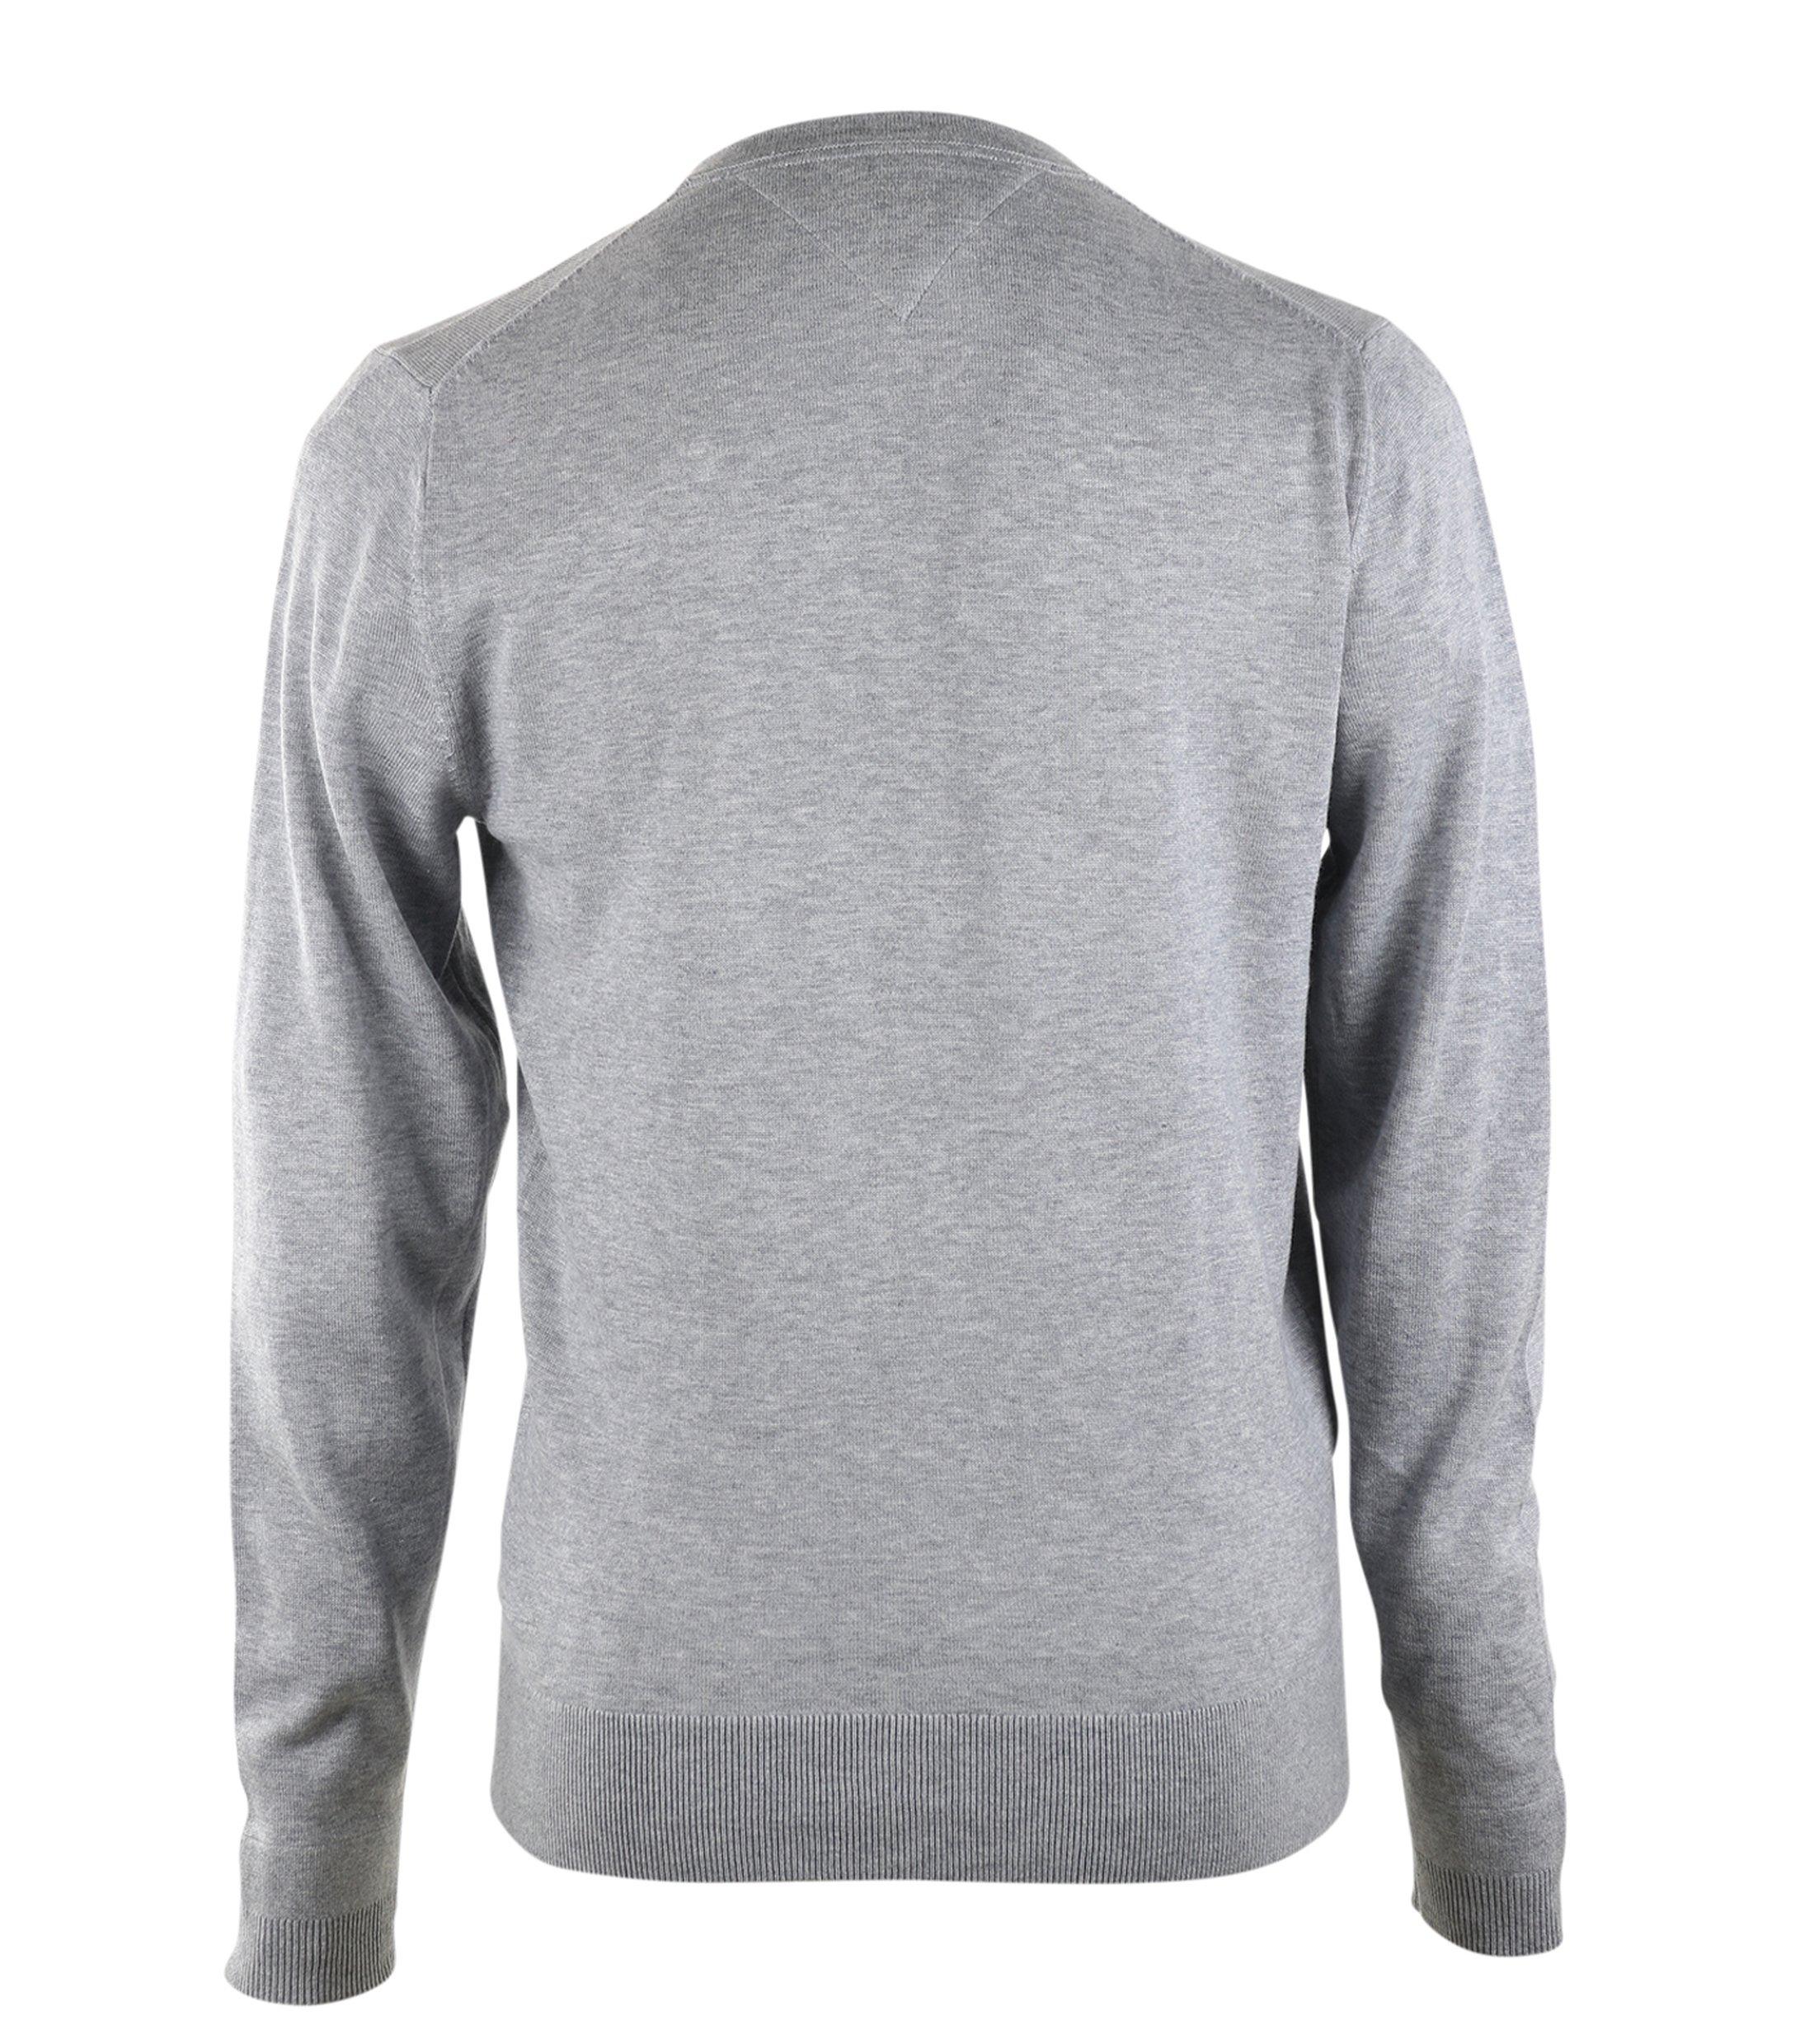 tommy hilfiger pullover v ausschnitt grau online kaufen. Black Bedroom Furniture Sets. Home Design Ideas